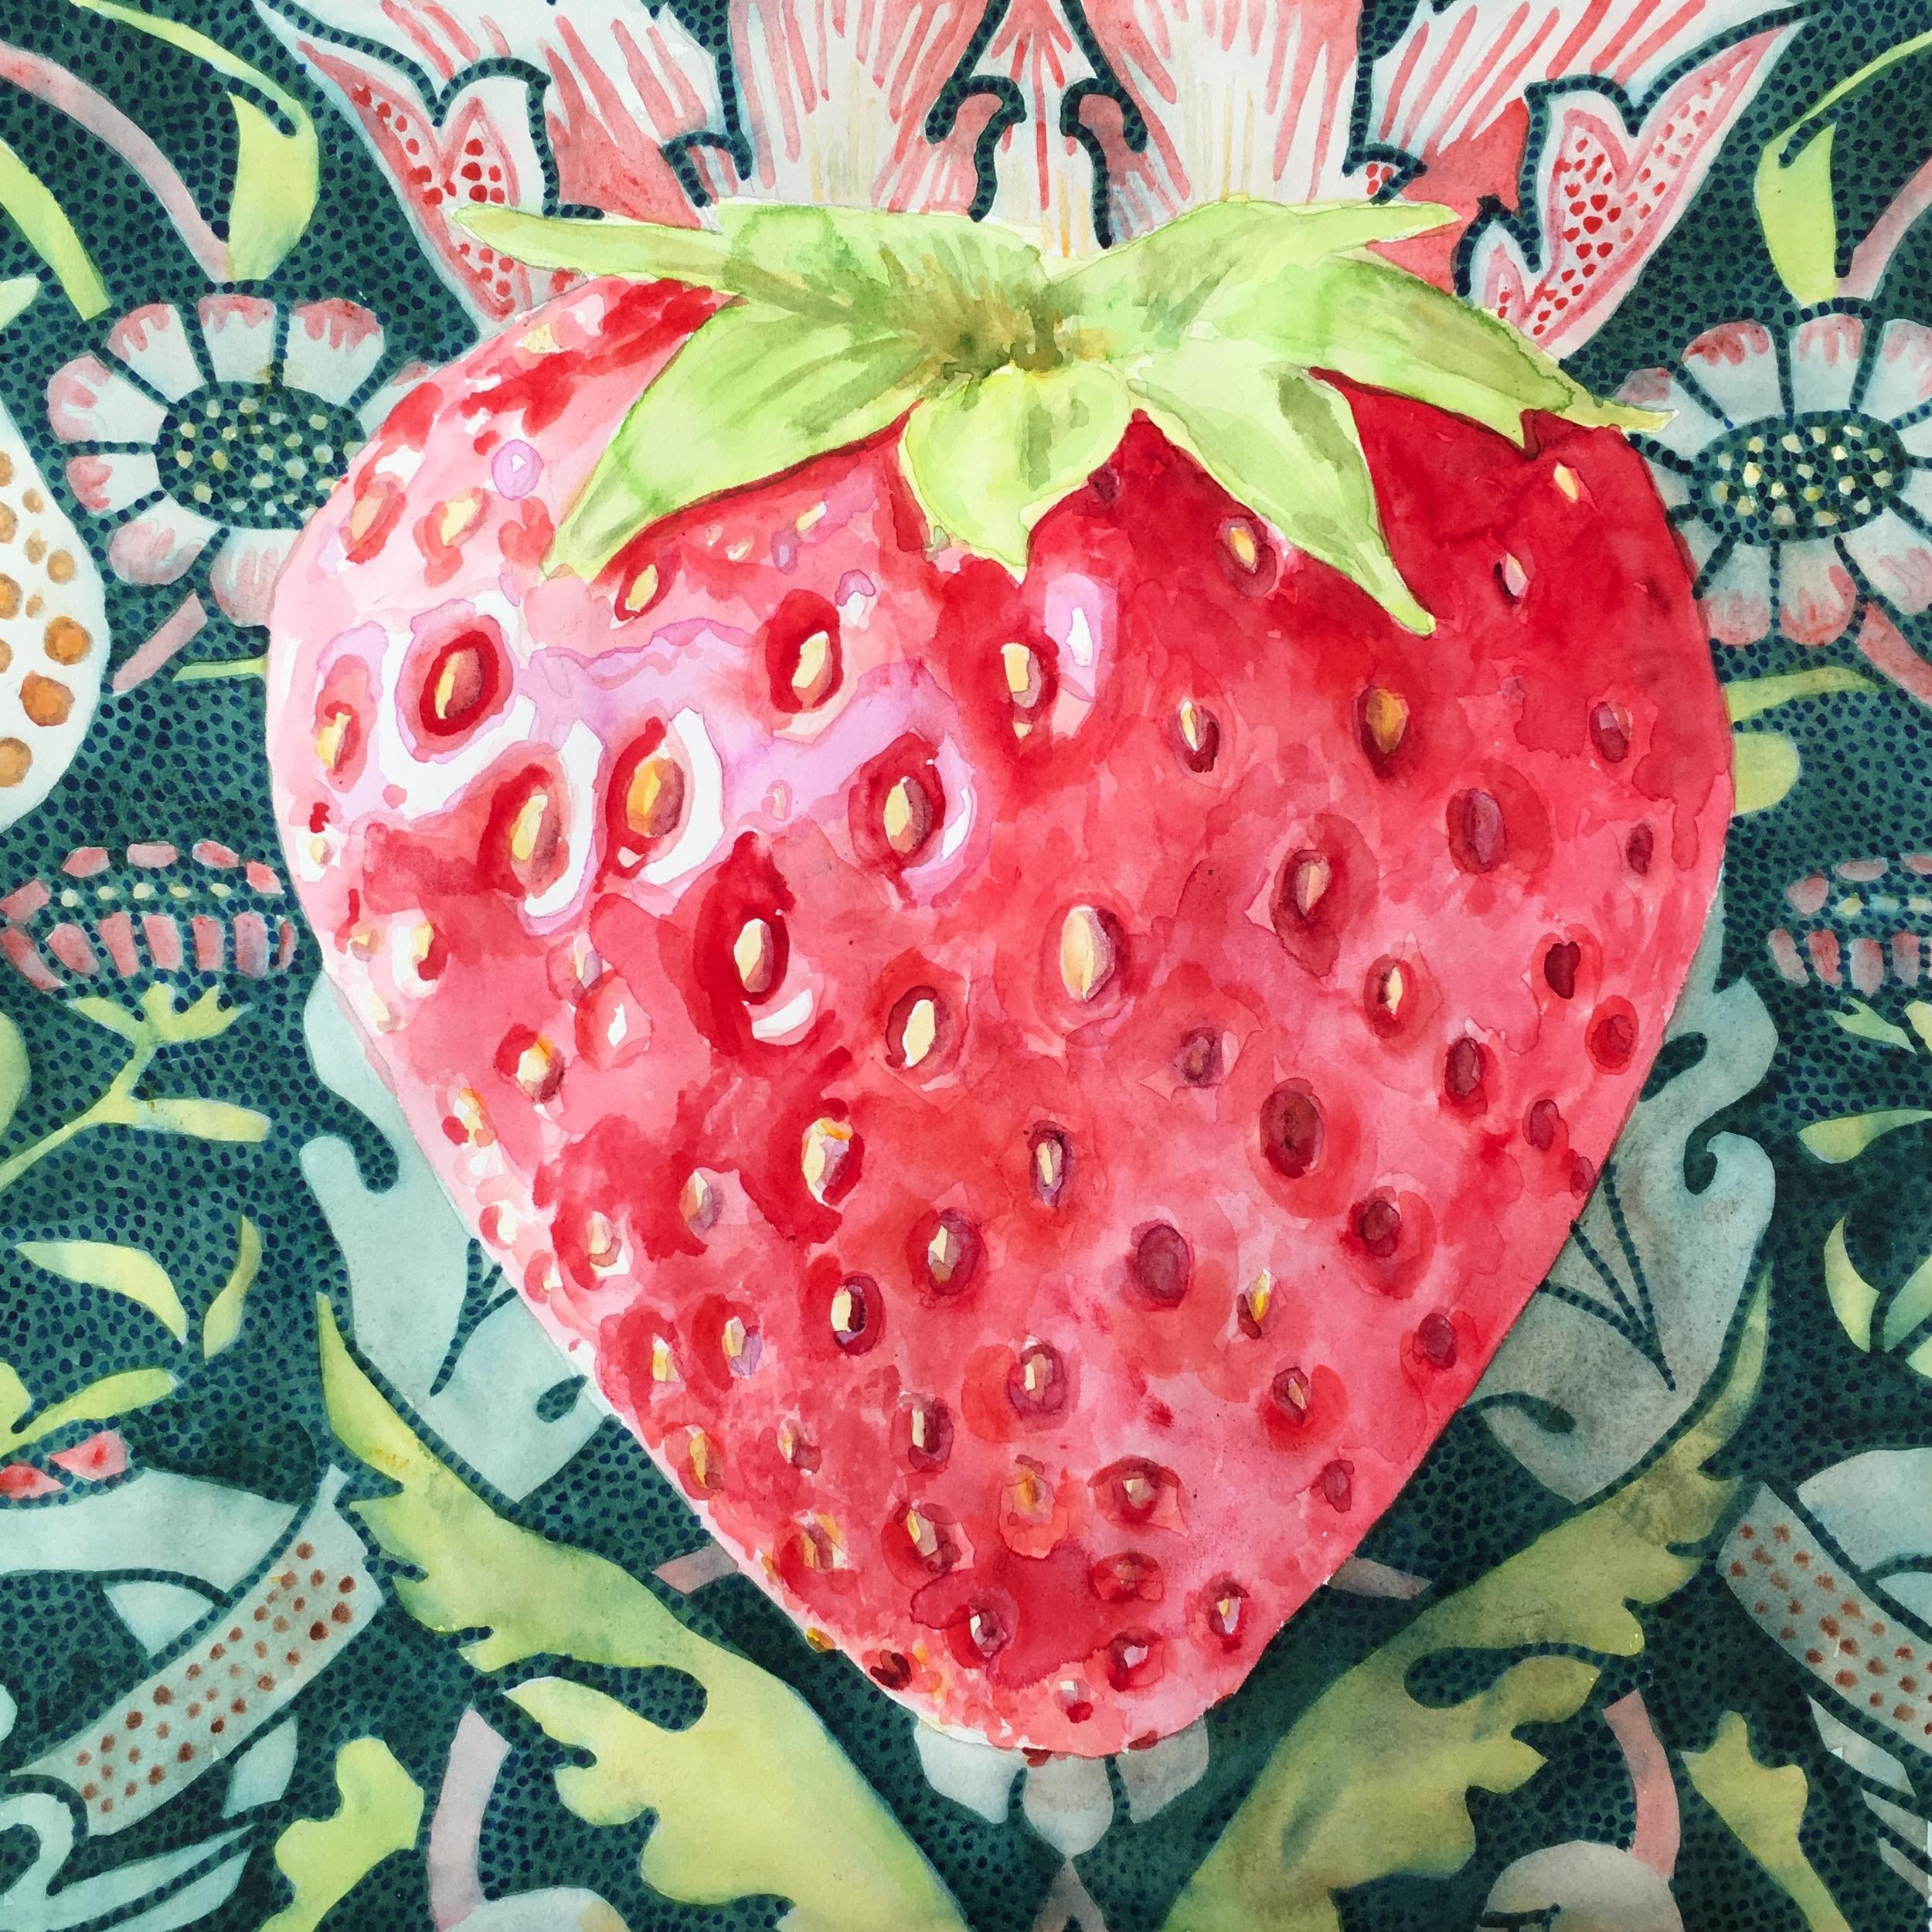 Strawberry Thief II